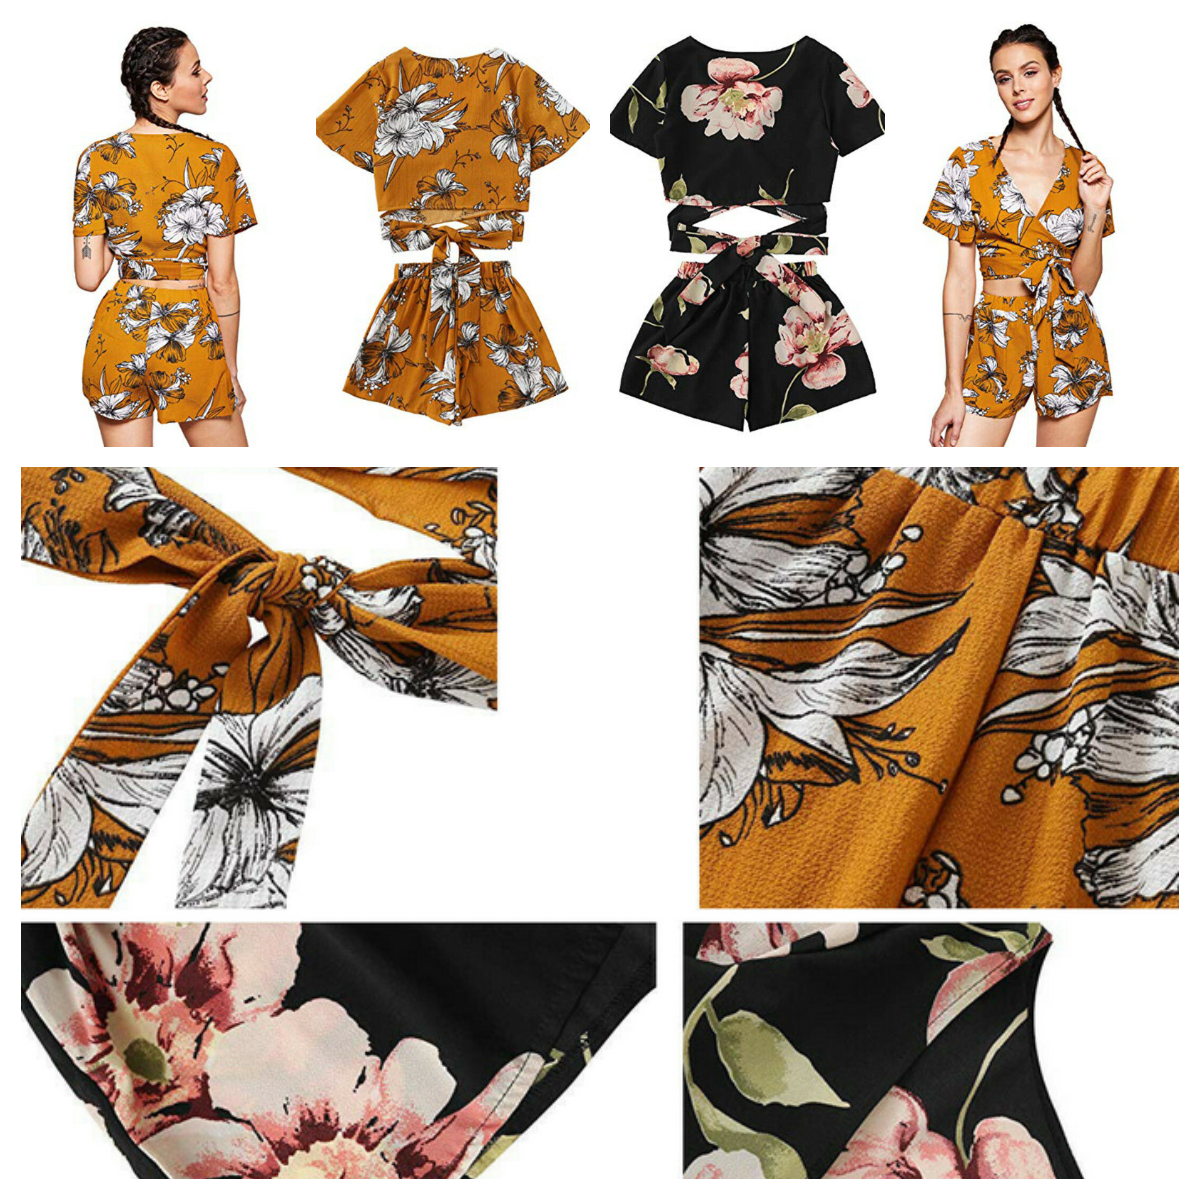 2 Piece Set Women 2019 New Summer Women Casual Floral Short Sleeve V-Neck Crop Tops+Loose Elastic Waist Shorts